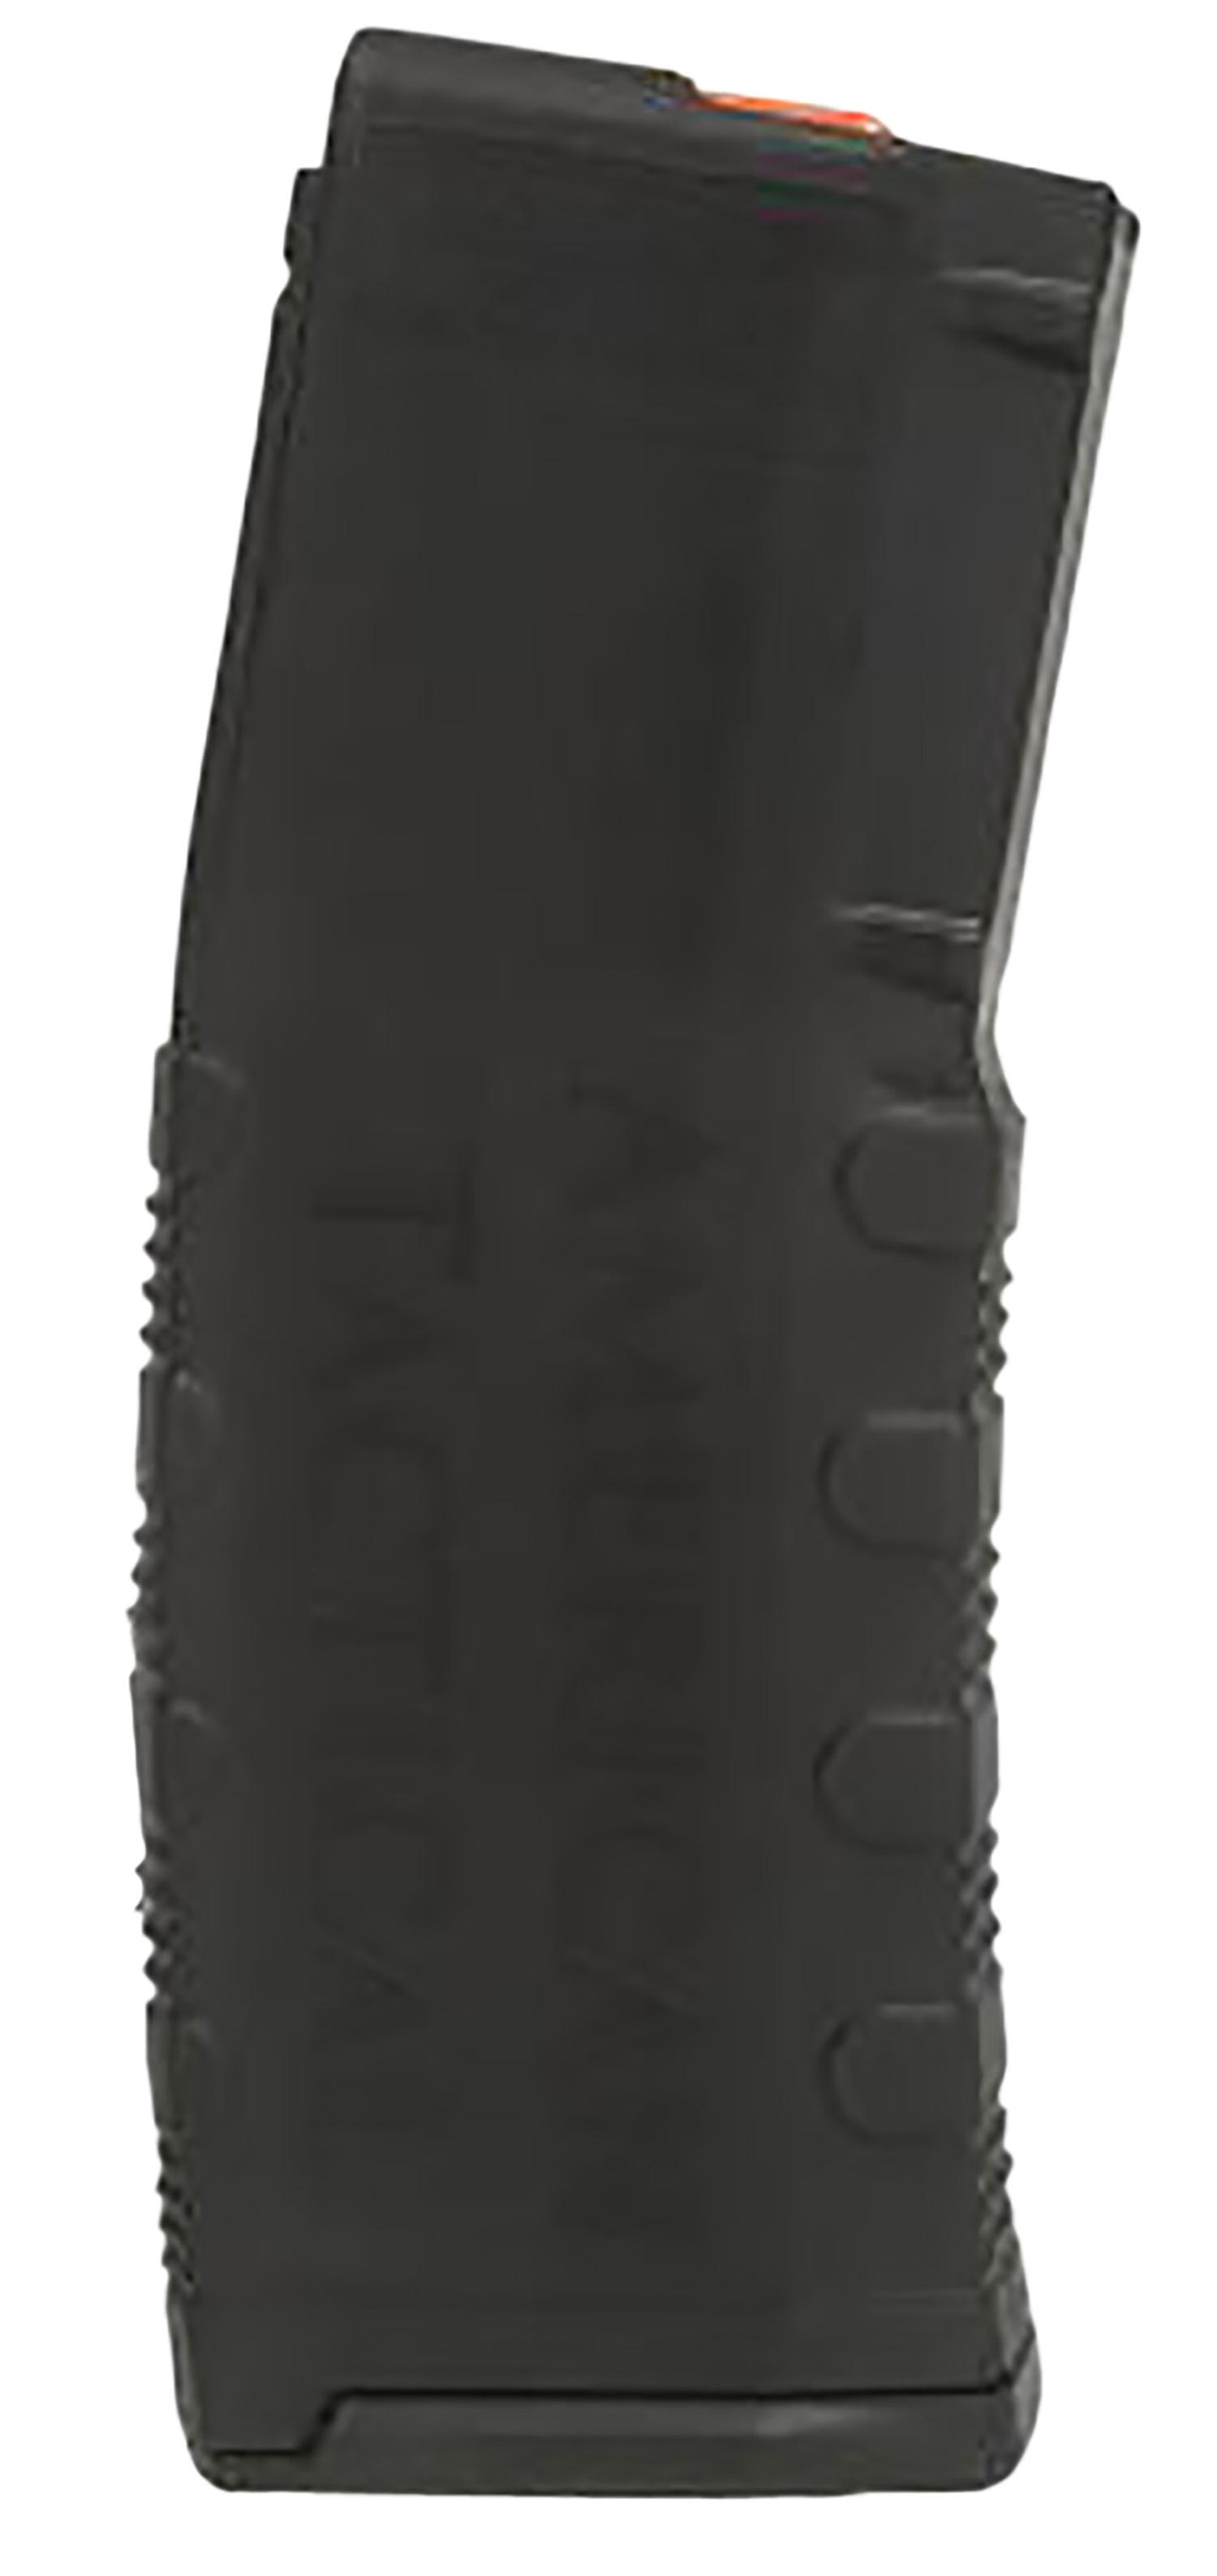 ATI ATIMAM2B30 OEM  223 Rem,300 Blackout,5.56x45mm NATO AR-15 30rd Black Detachable